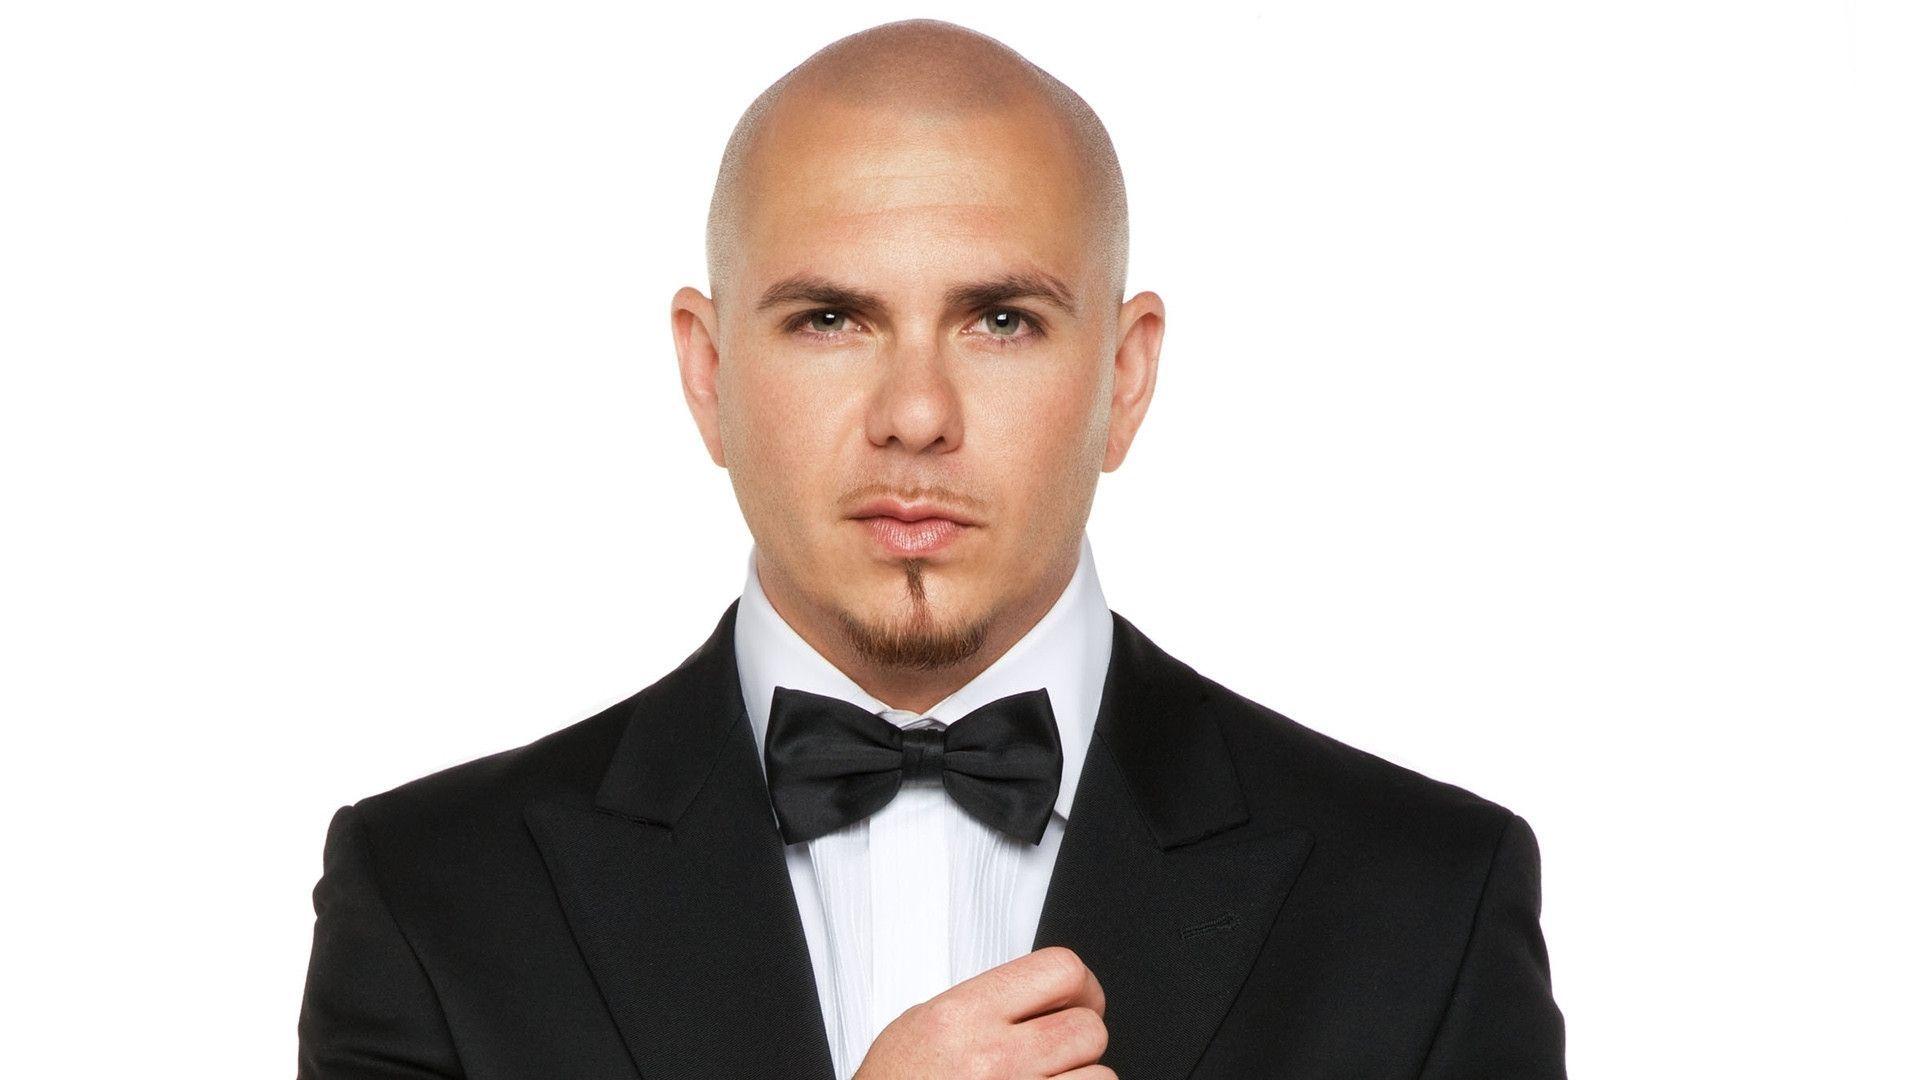 Pitbull Rapper Wallpapers